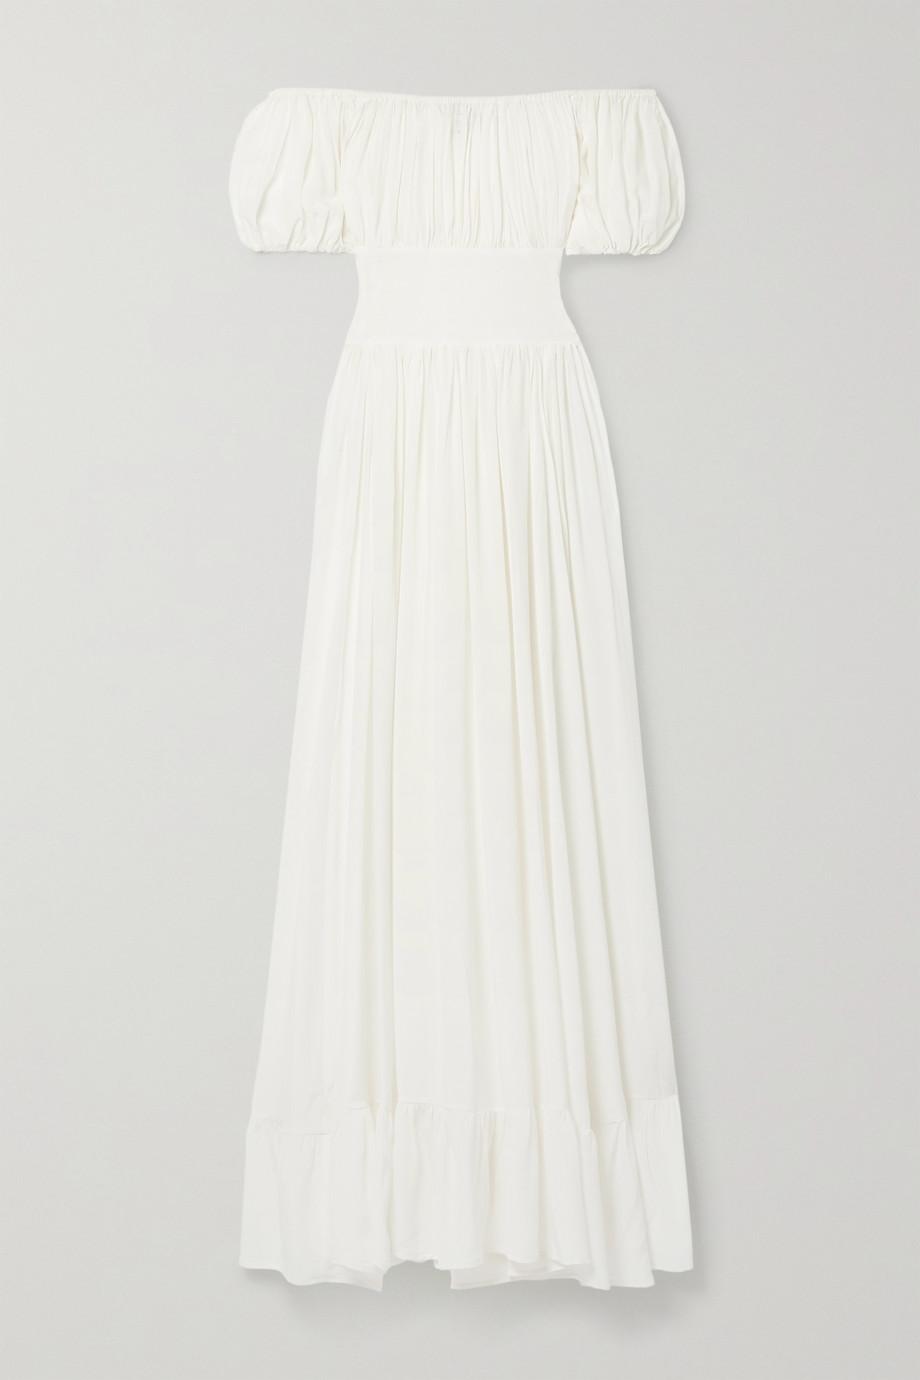 Evarae + NET SUSTAIN Hestia organic mulberry silk maxi dress